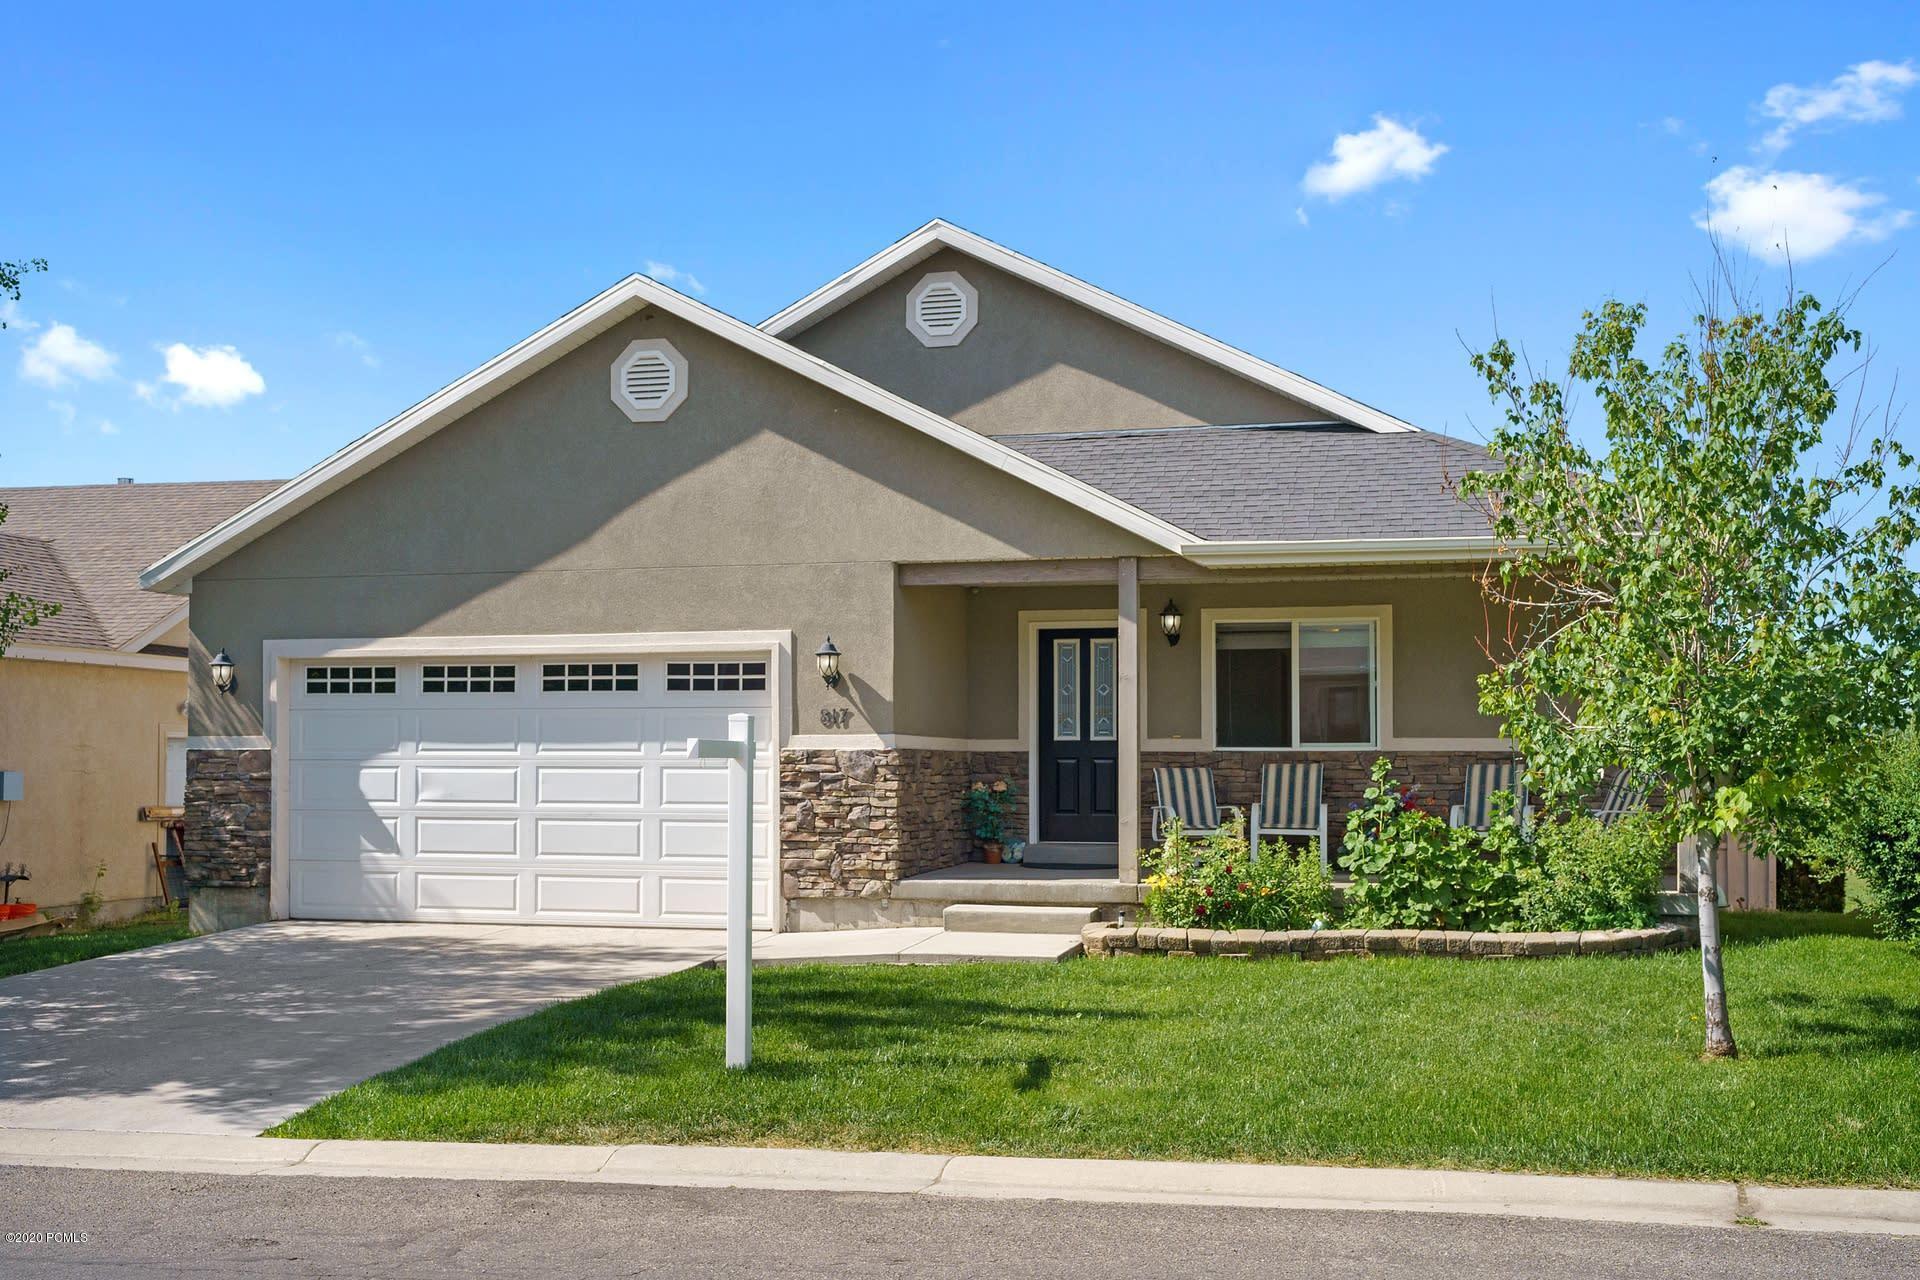 817 Saddle Drive, Oakley, Utah 84055, 3 Bedrooms Bedrooms, ,2 BathroomsBathrooms,Single Family,For Sale,Saddle,12002542